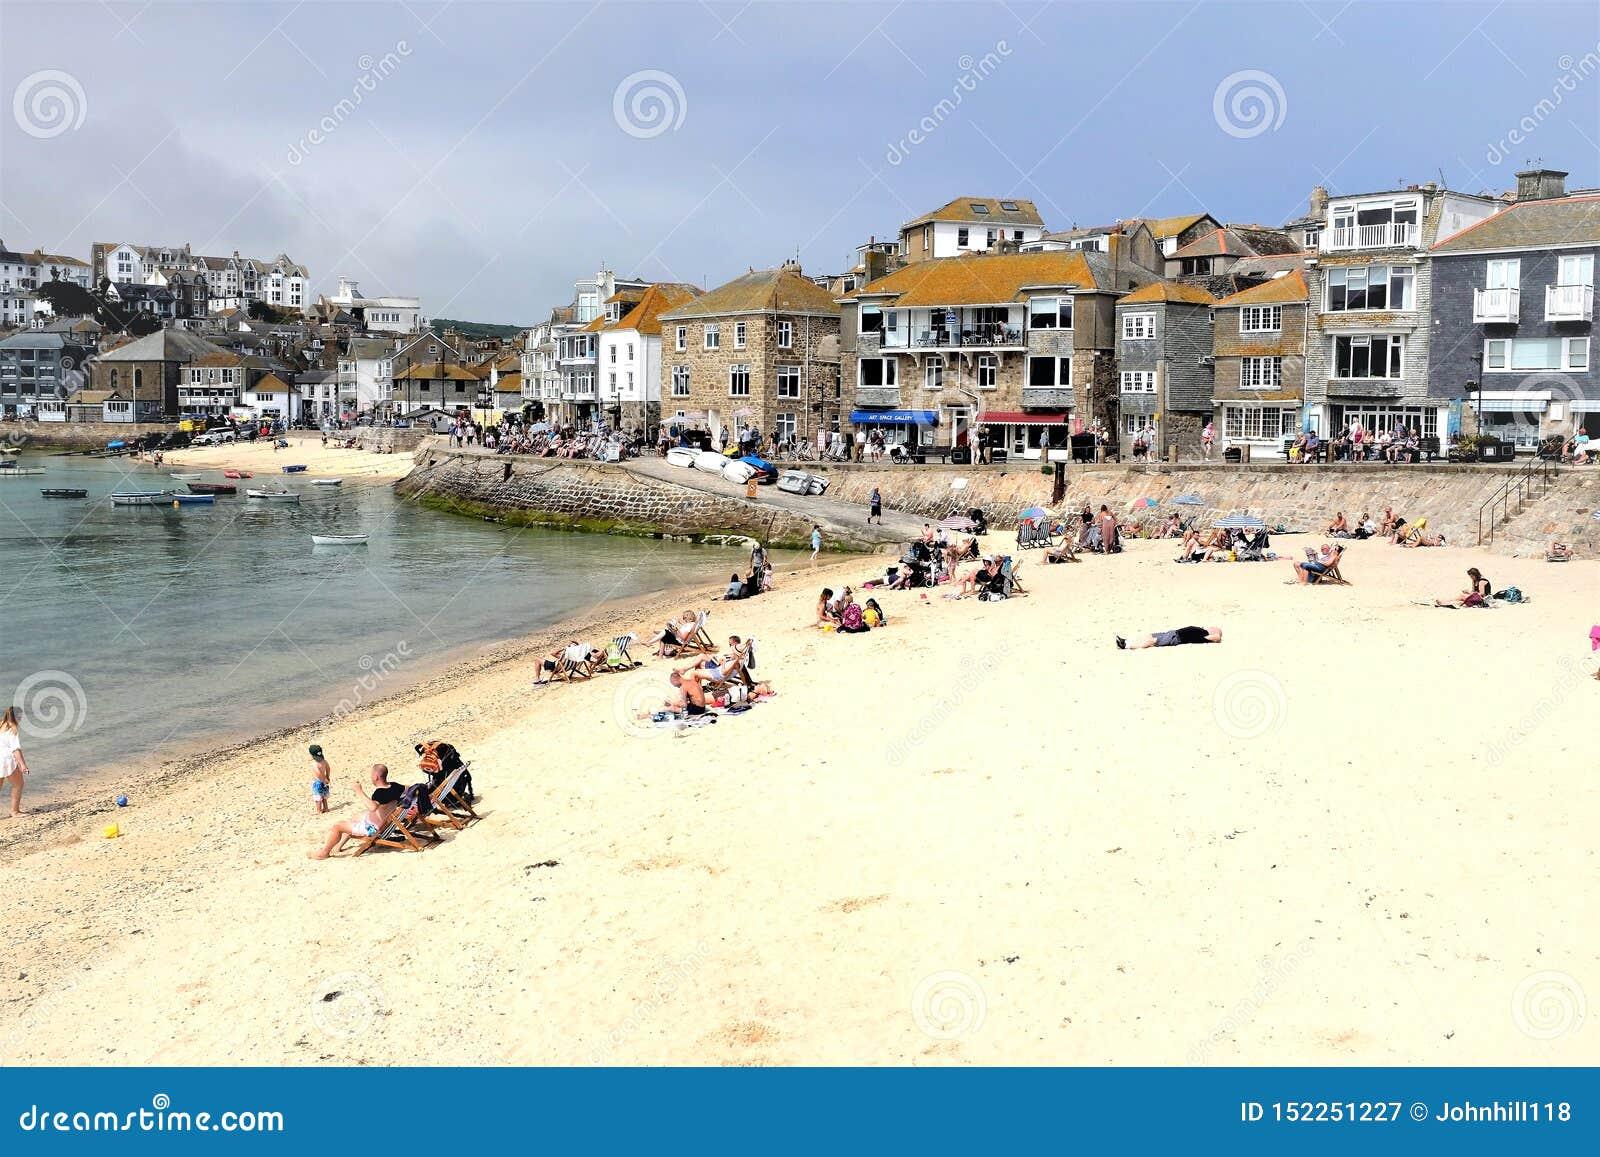 Warf road and harbor beaches, St. Ives, Cornwall, UK